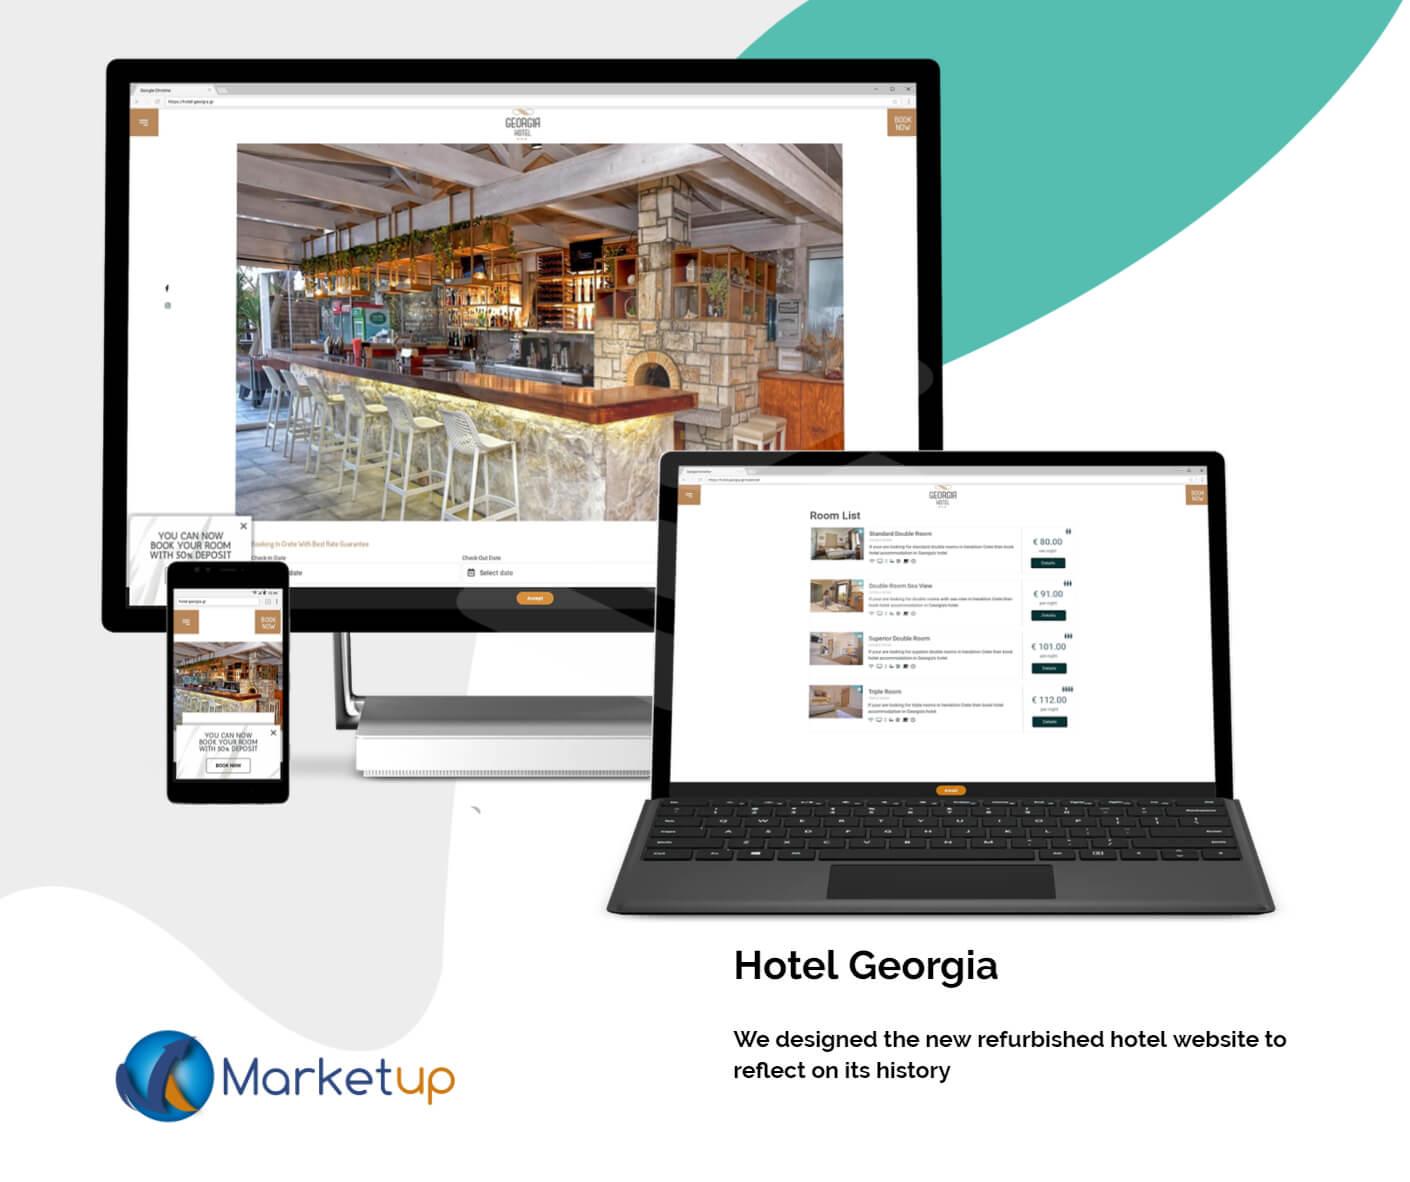 Online-Marketing-Marketup